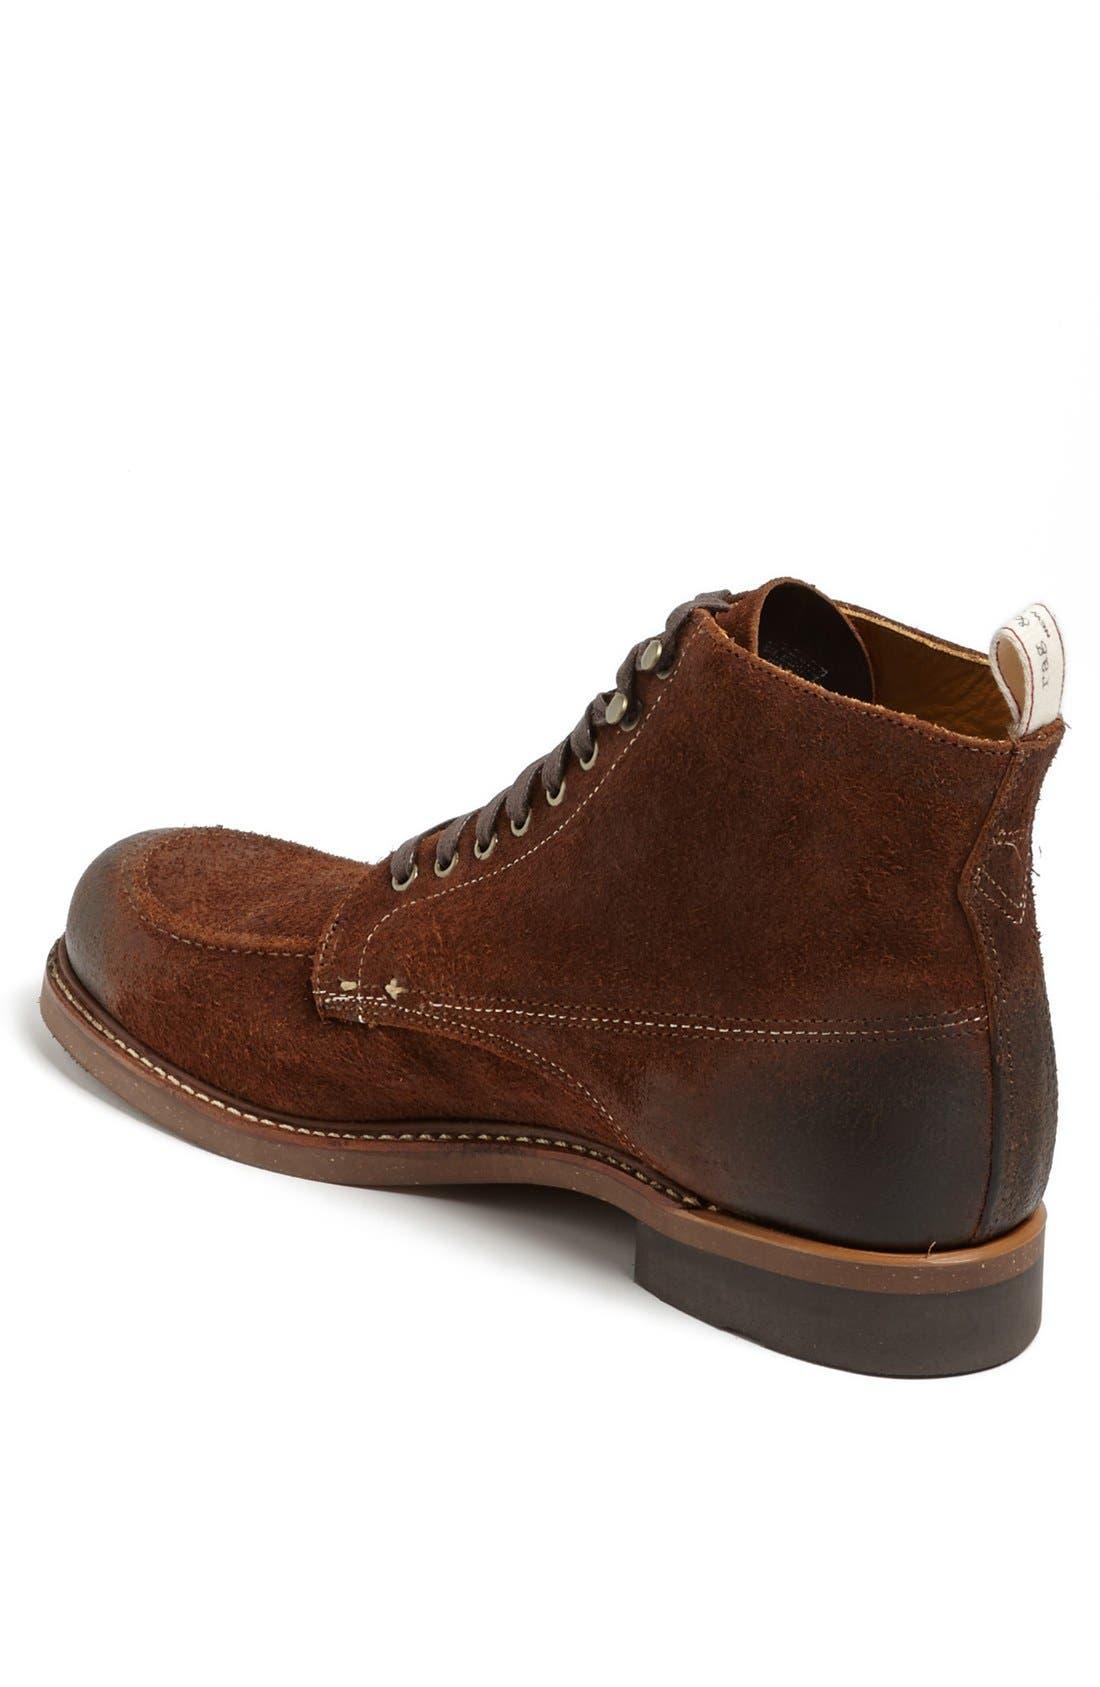 'Rowan' Moc Toe Boot,                             Alternate thumbnail 4, color,                             200